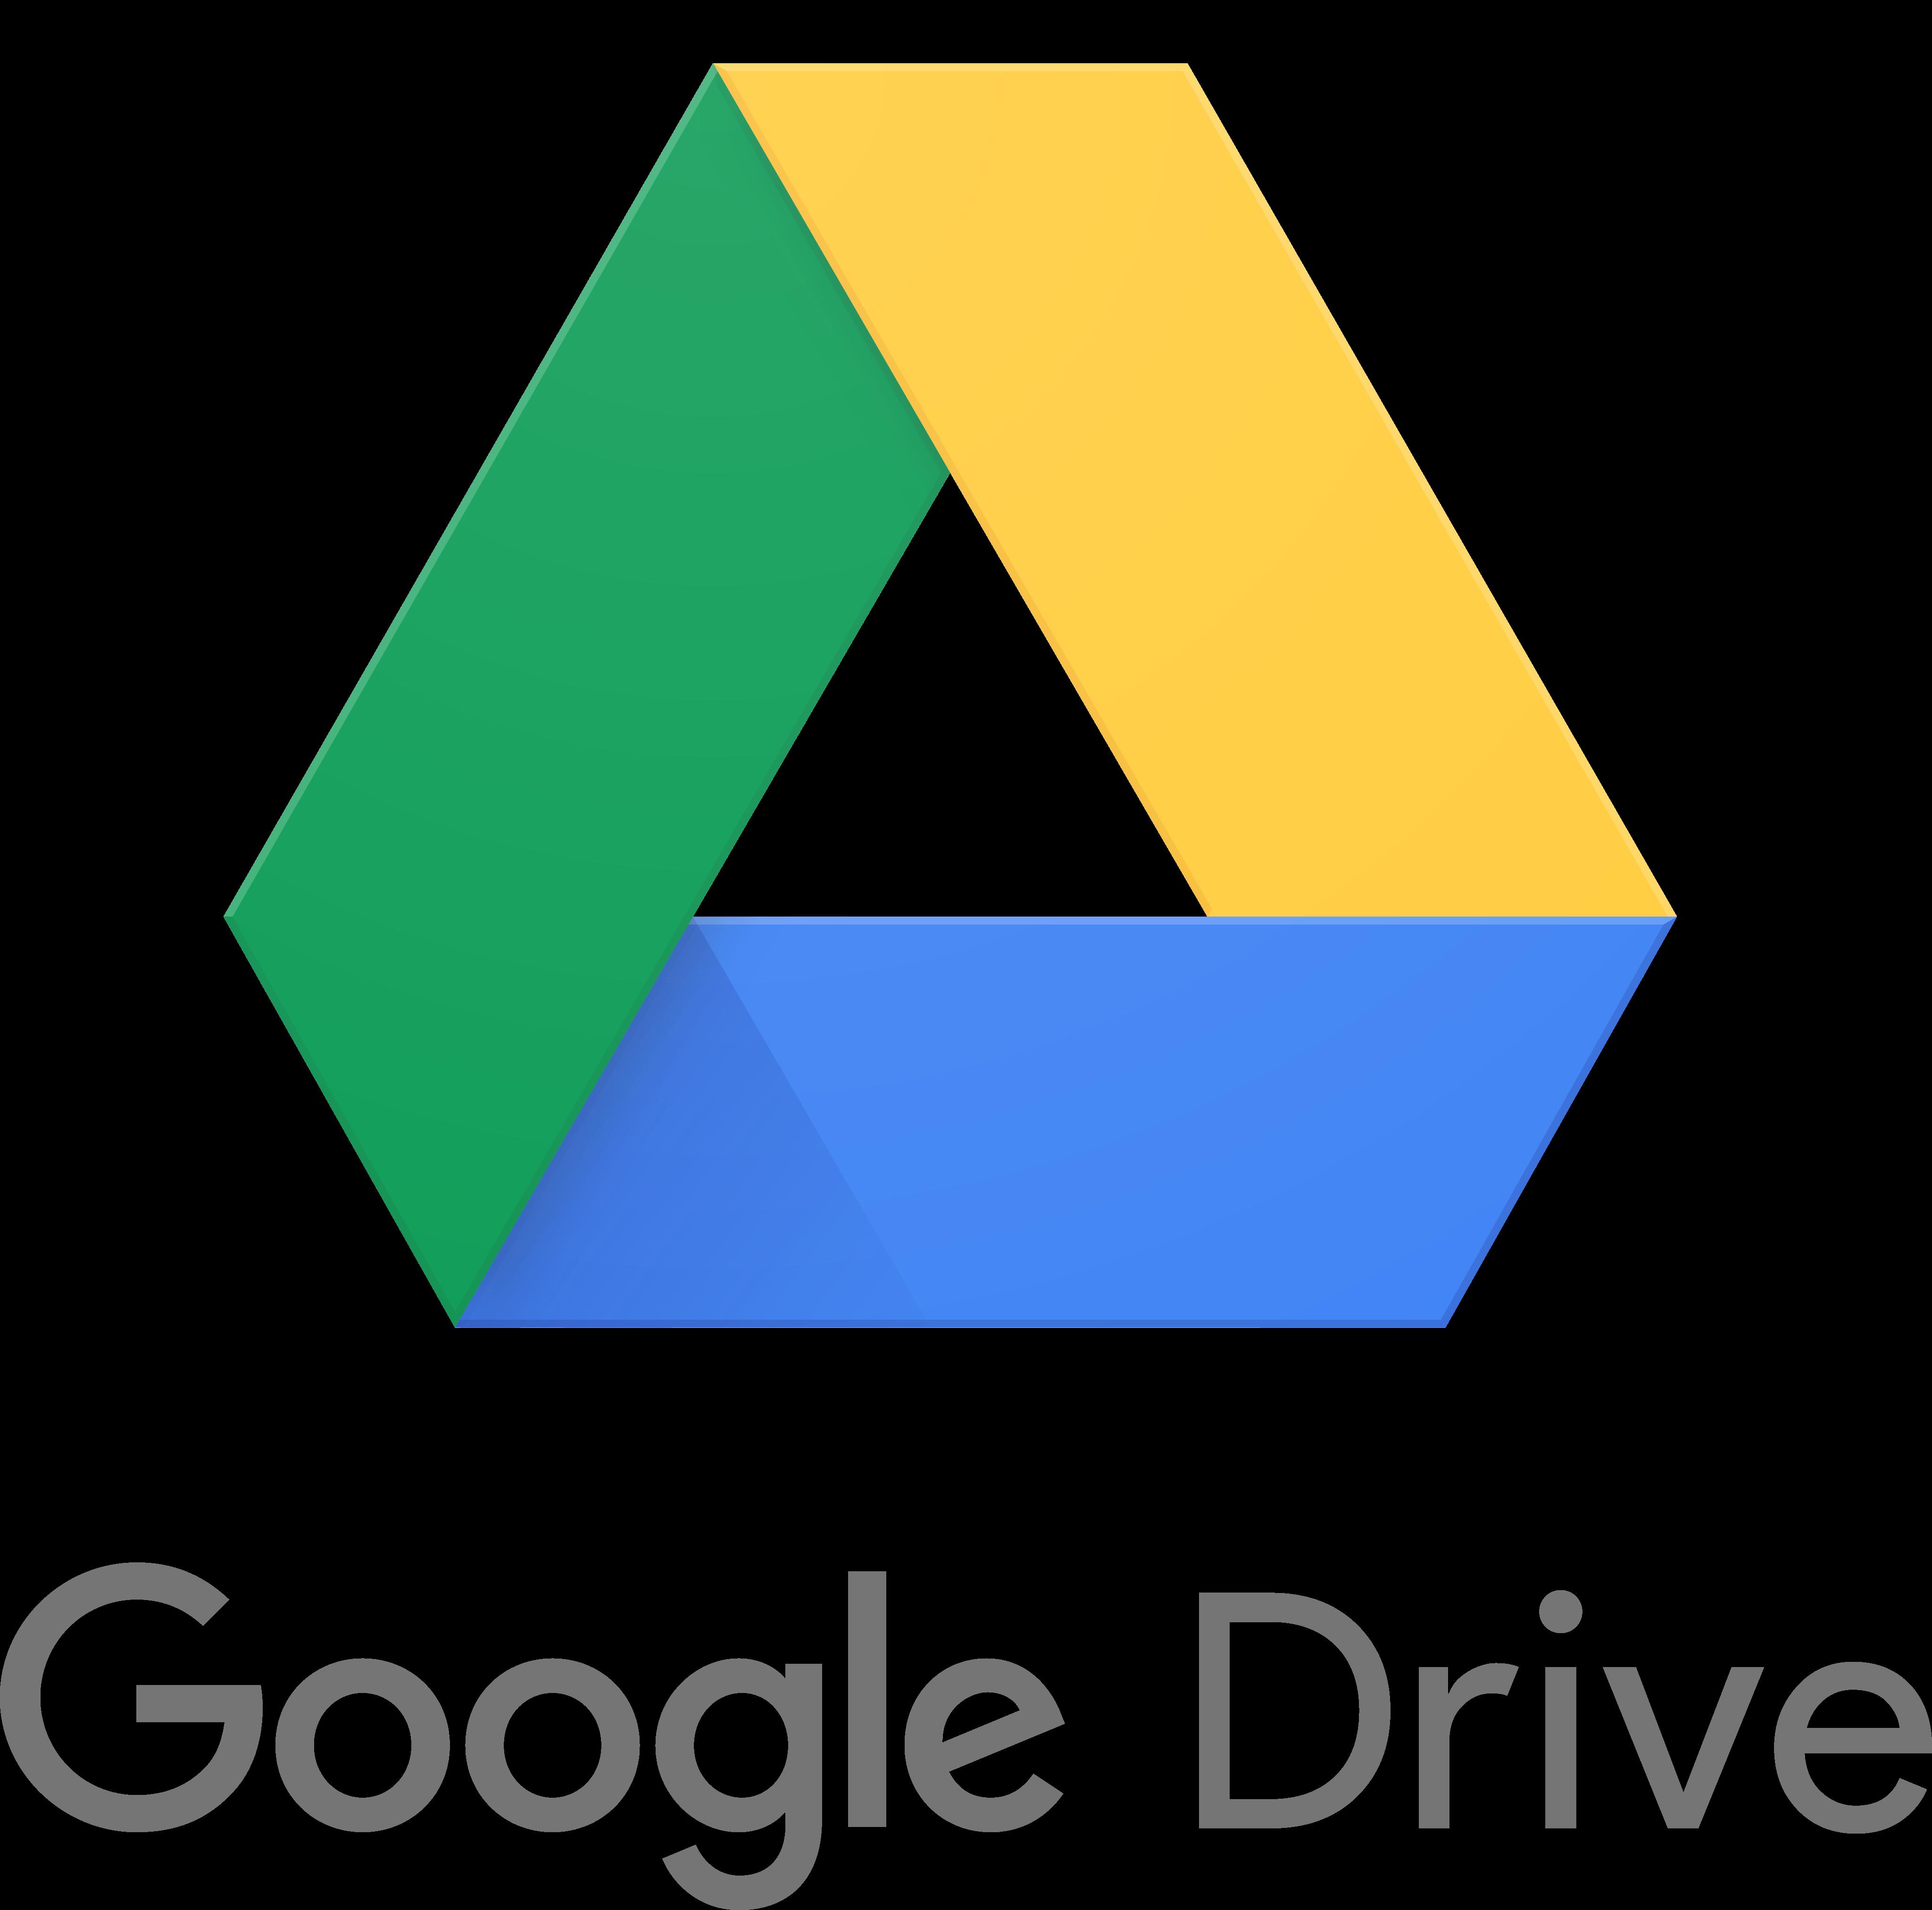 google drive logo 2 - Google Drive Logo